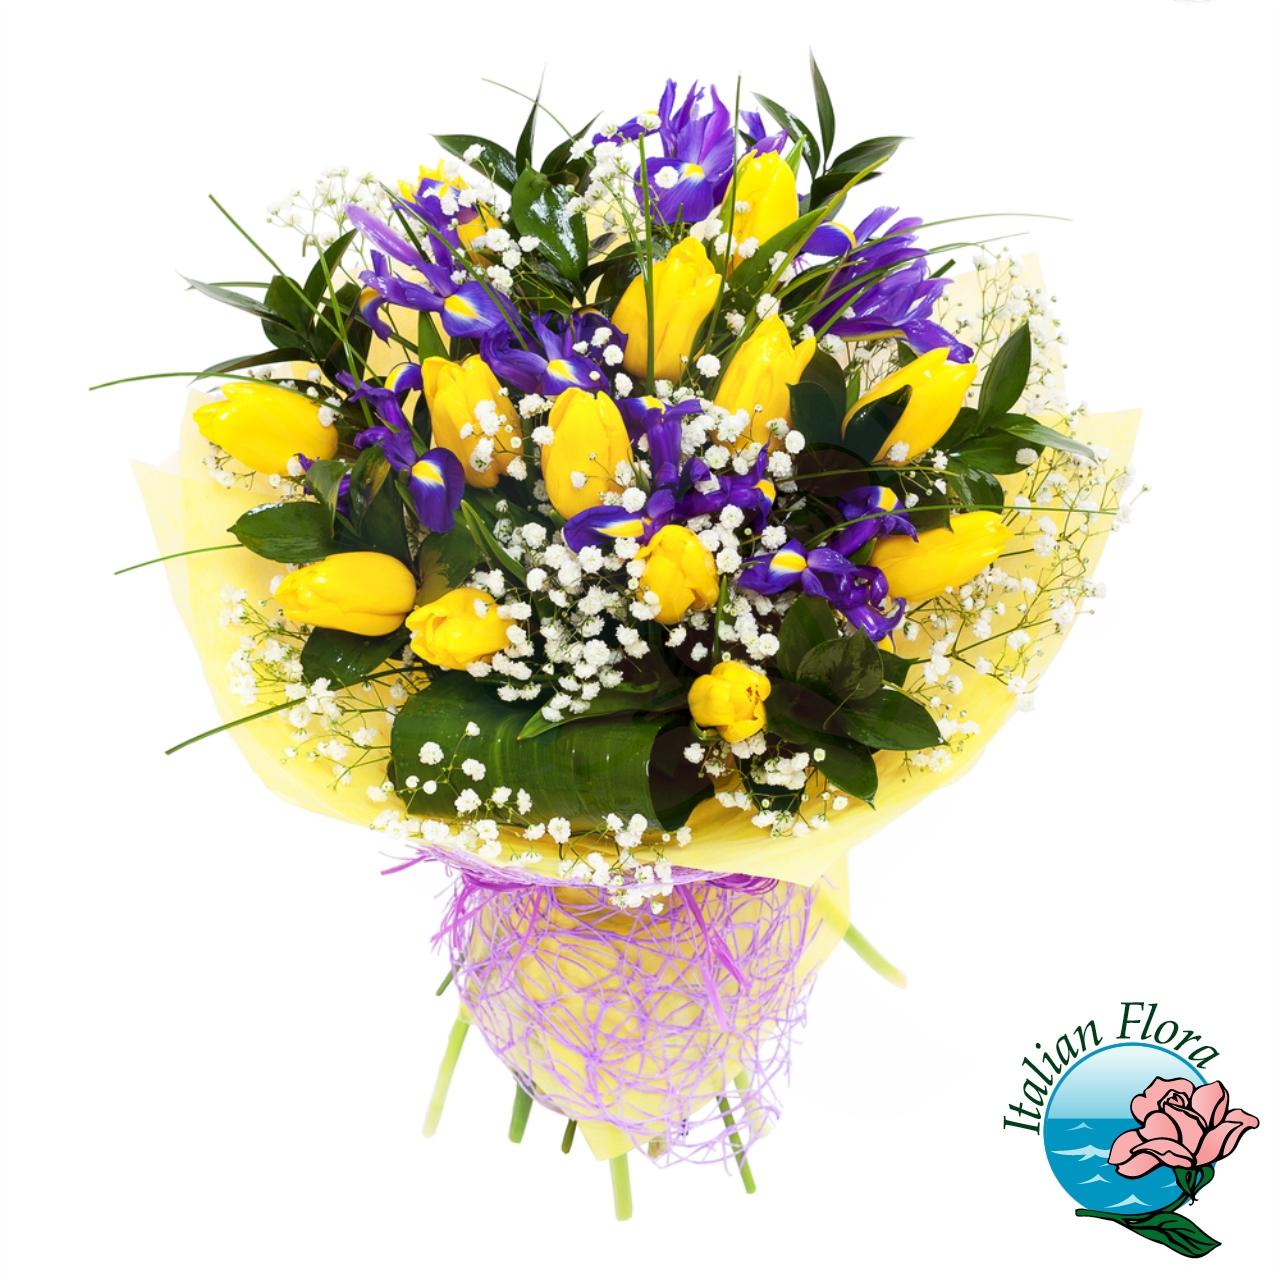 Mazzo Di Fiori Iris.Bouquet Di Tulipani Gialli E Iris Blu